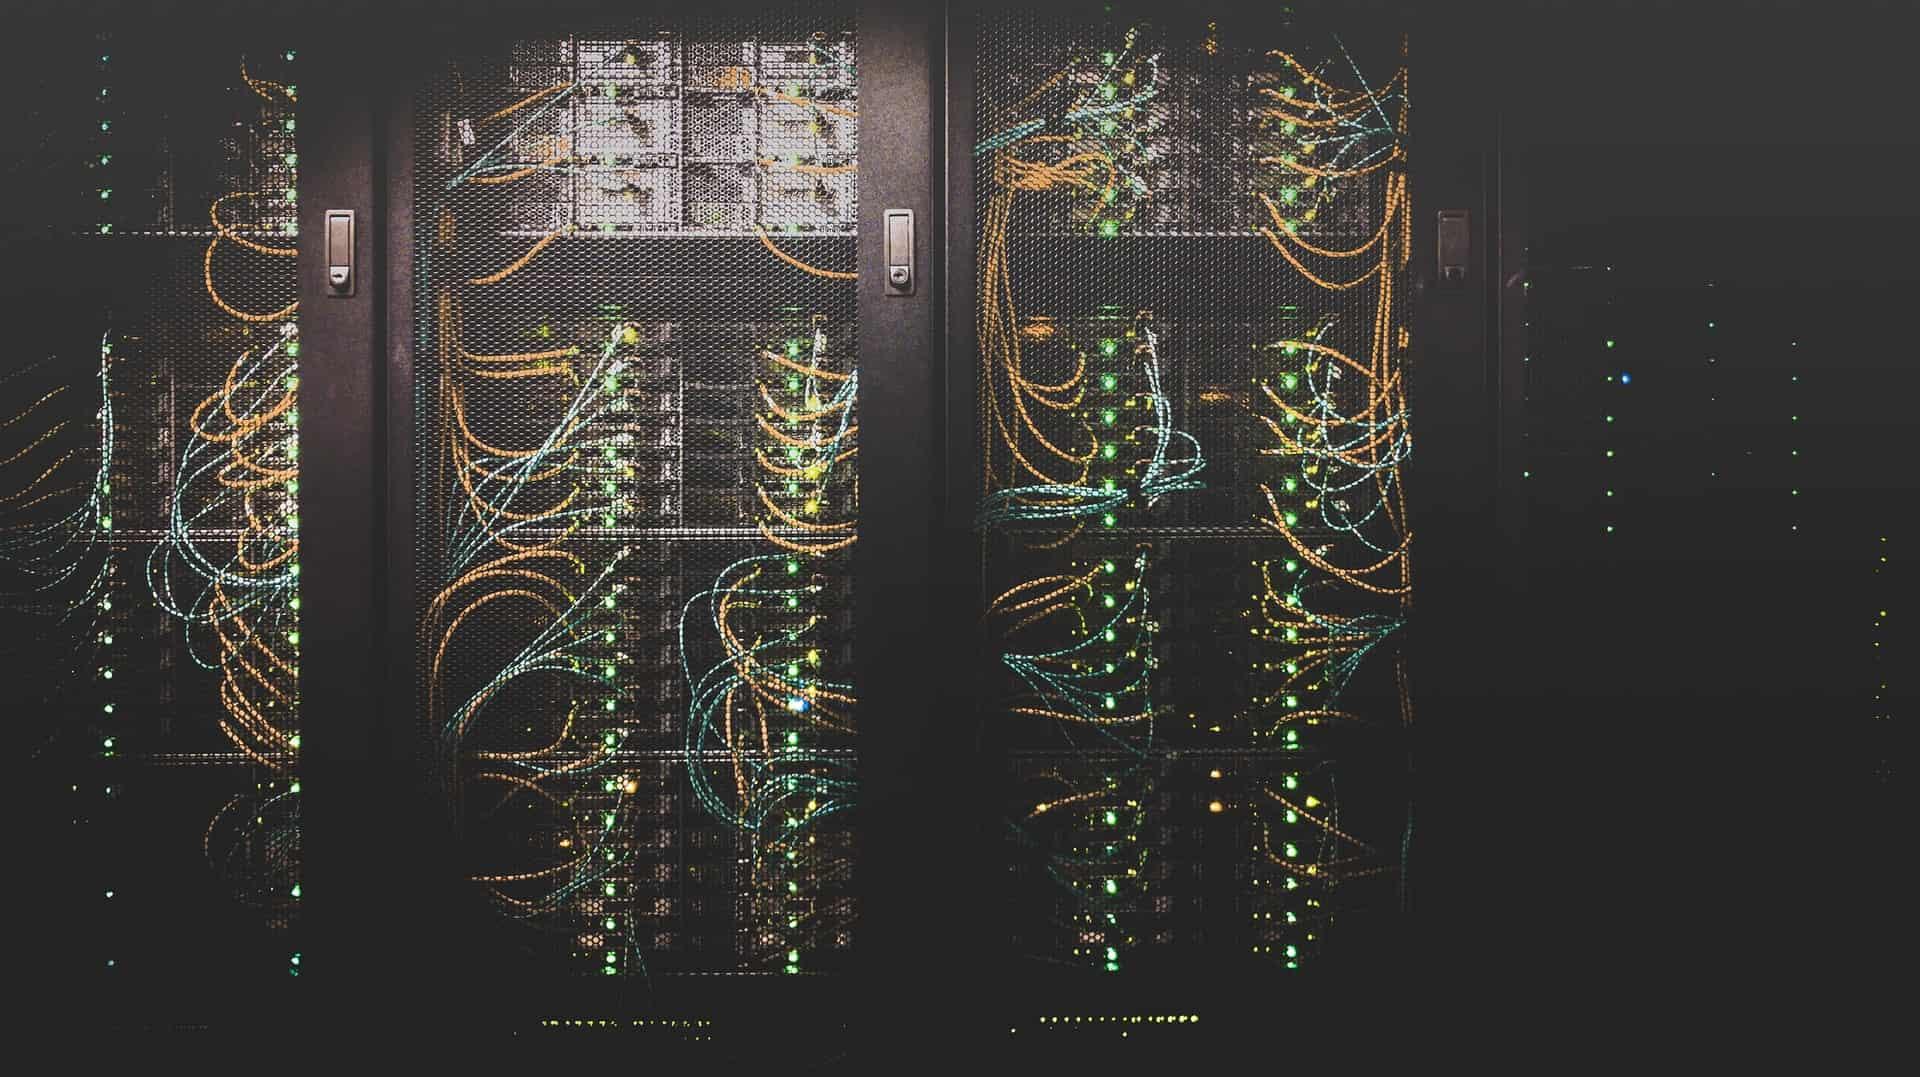 Dark server room